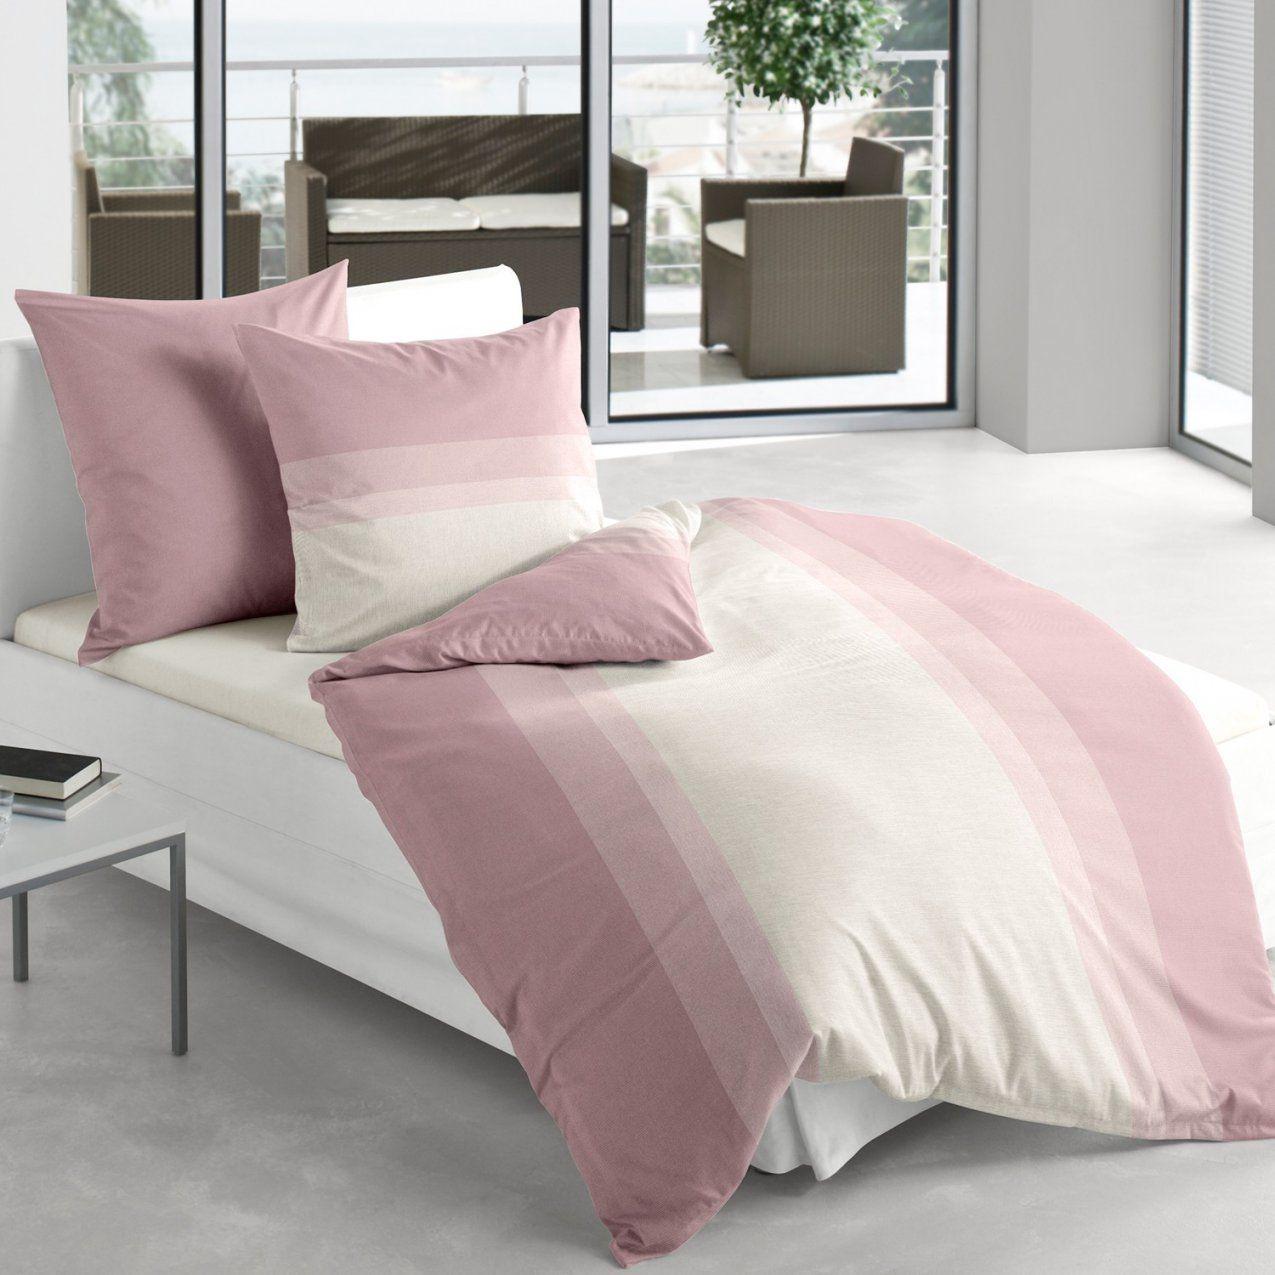 qvc winterengel bettw sche 10 teilig haus design ideen. Black Bedroom Furniture Sets. Home Design Ideas